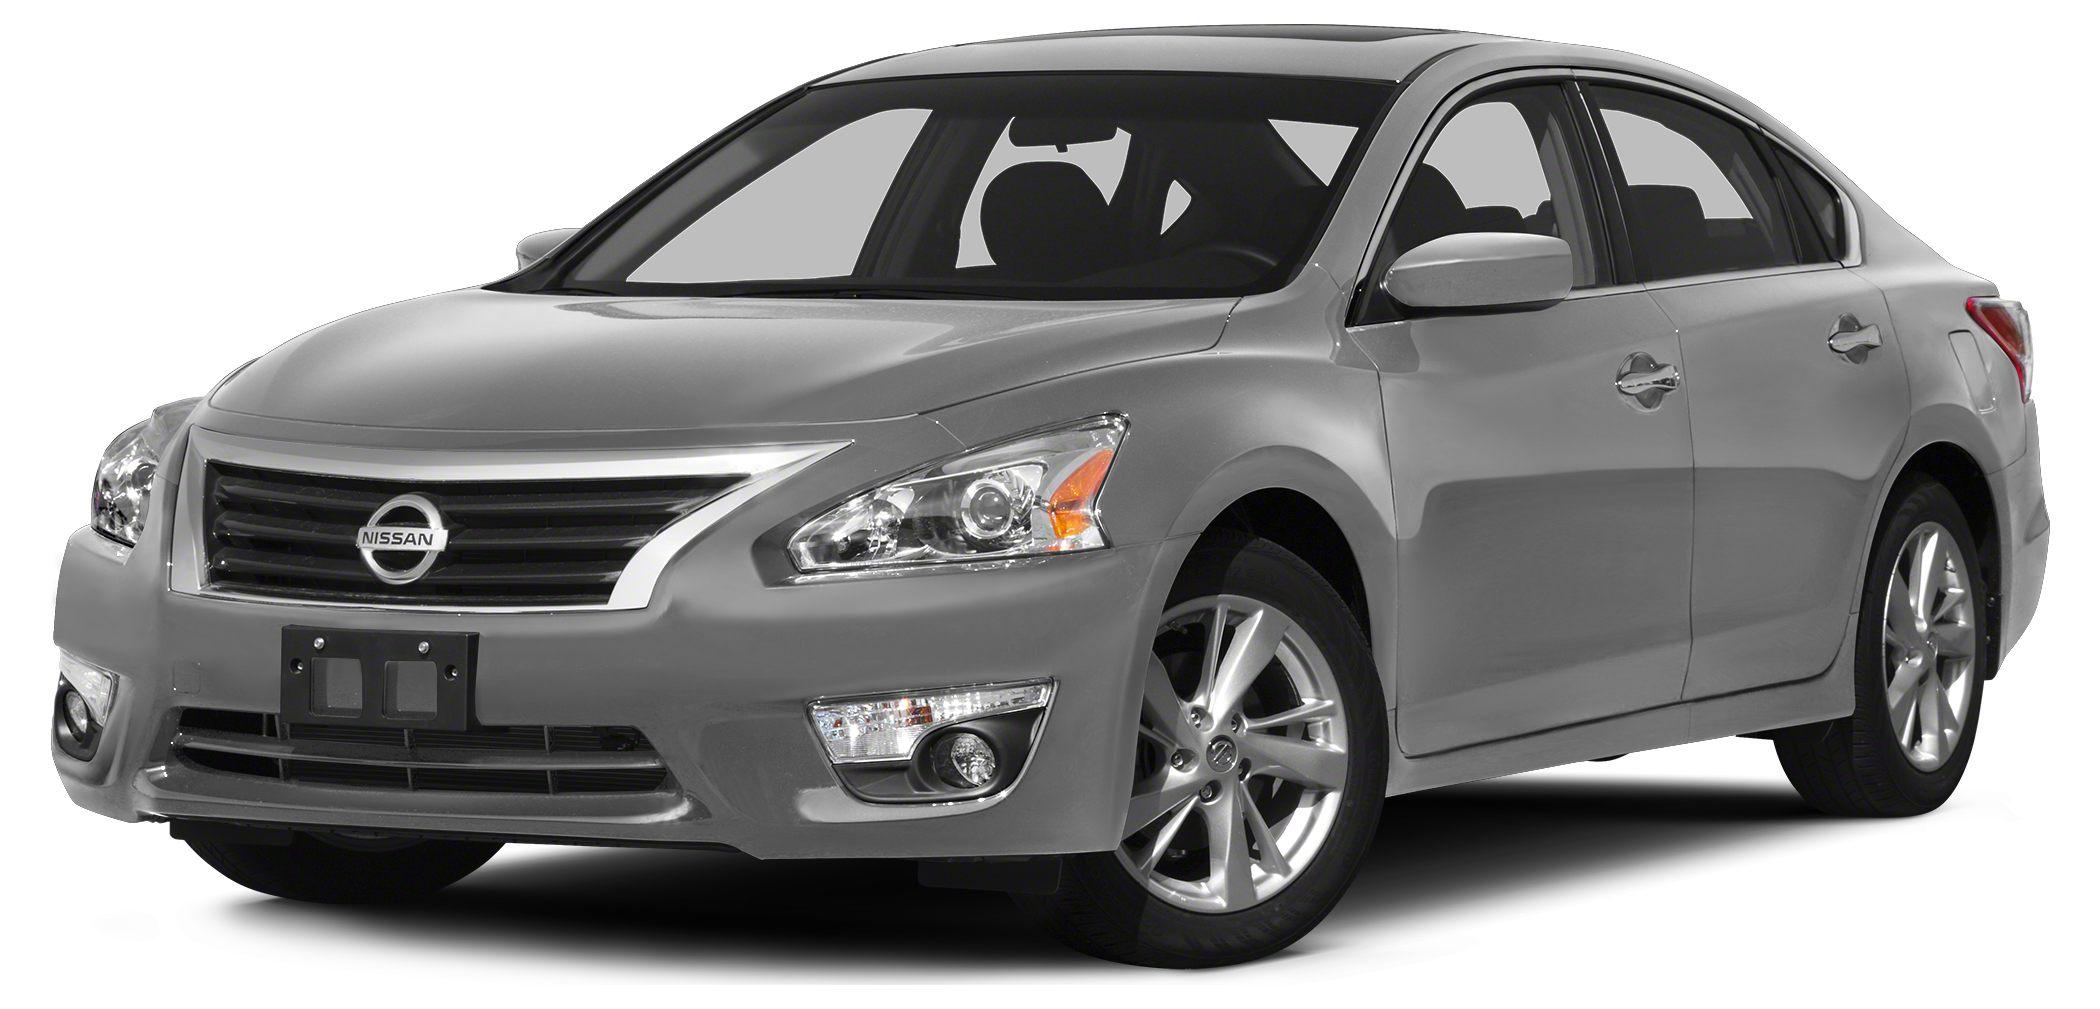 2015 Nissan Altima 25 SV Miles 14261Color Brilliant Silver Stock PN17009 VIN 1N4AL3AP5FC496